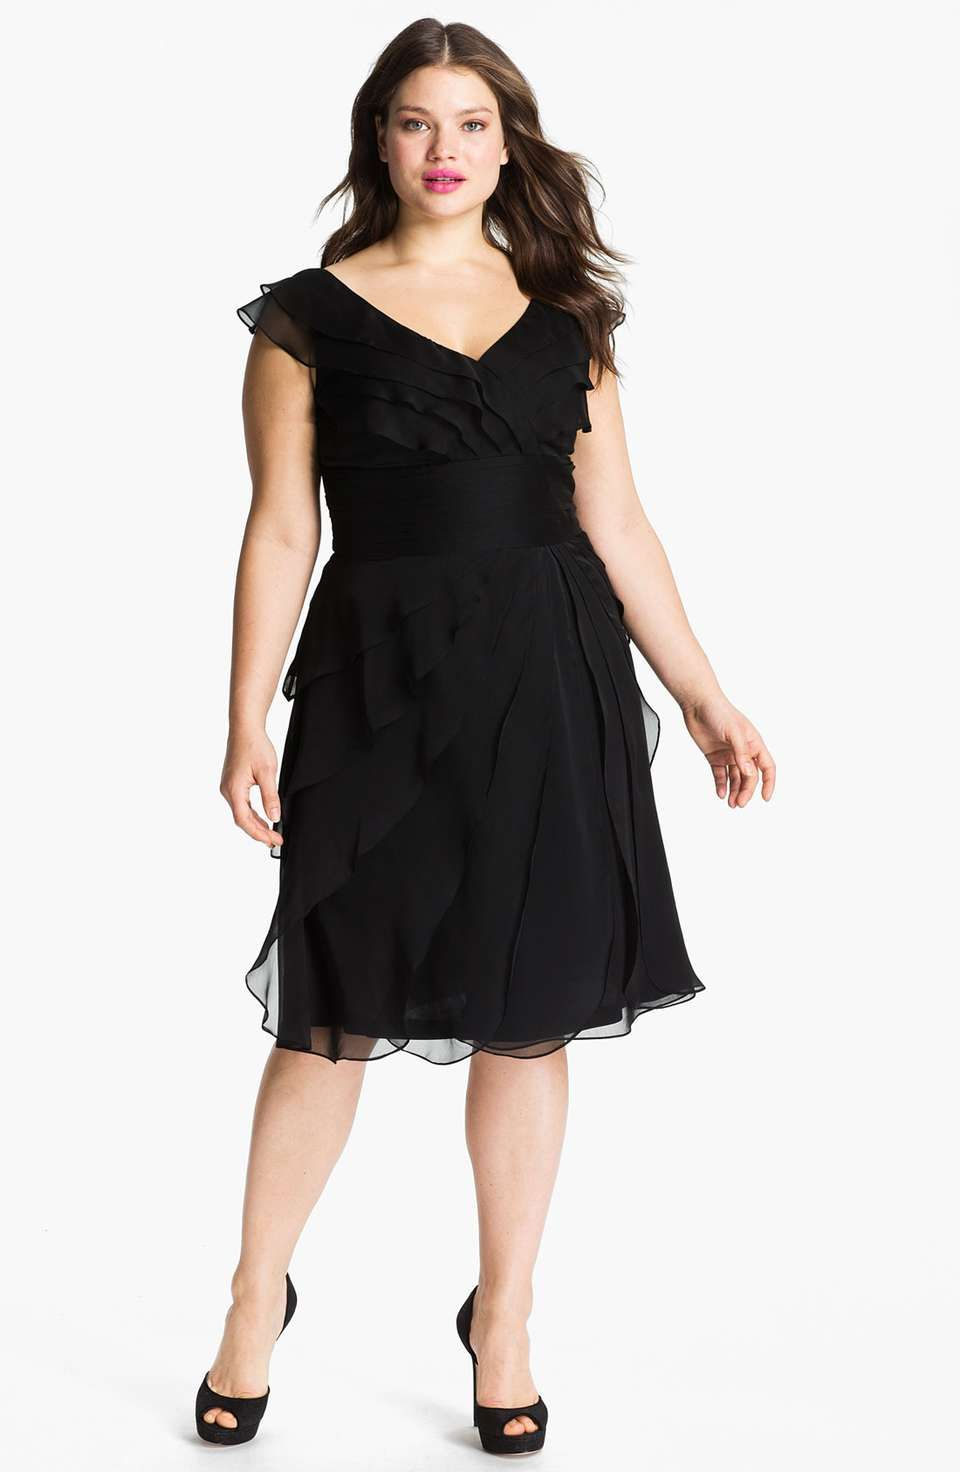 Adrianna Papell Chiffon Petal Gown (Plus Size)   Moda Fashion ...